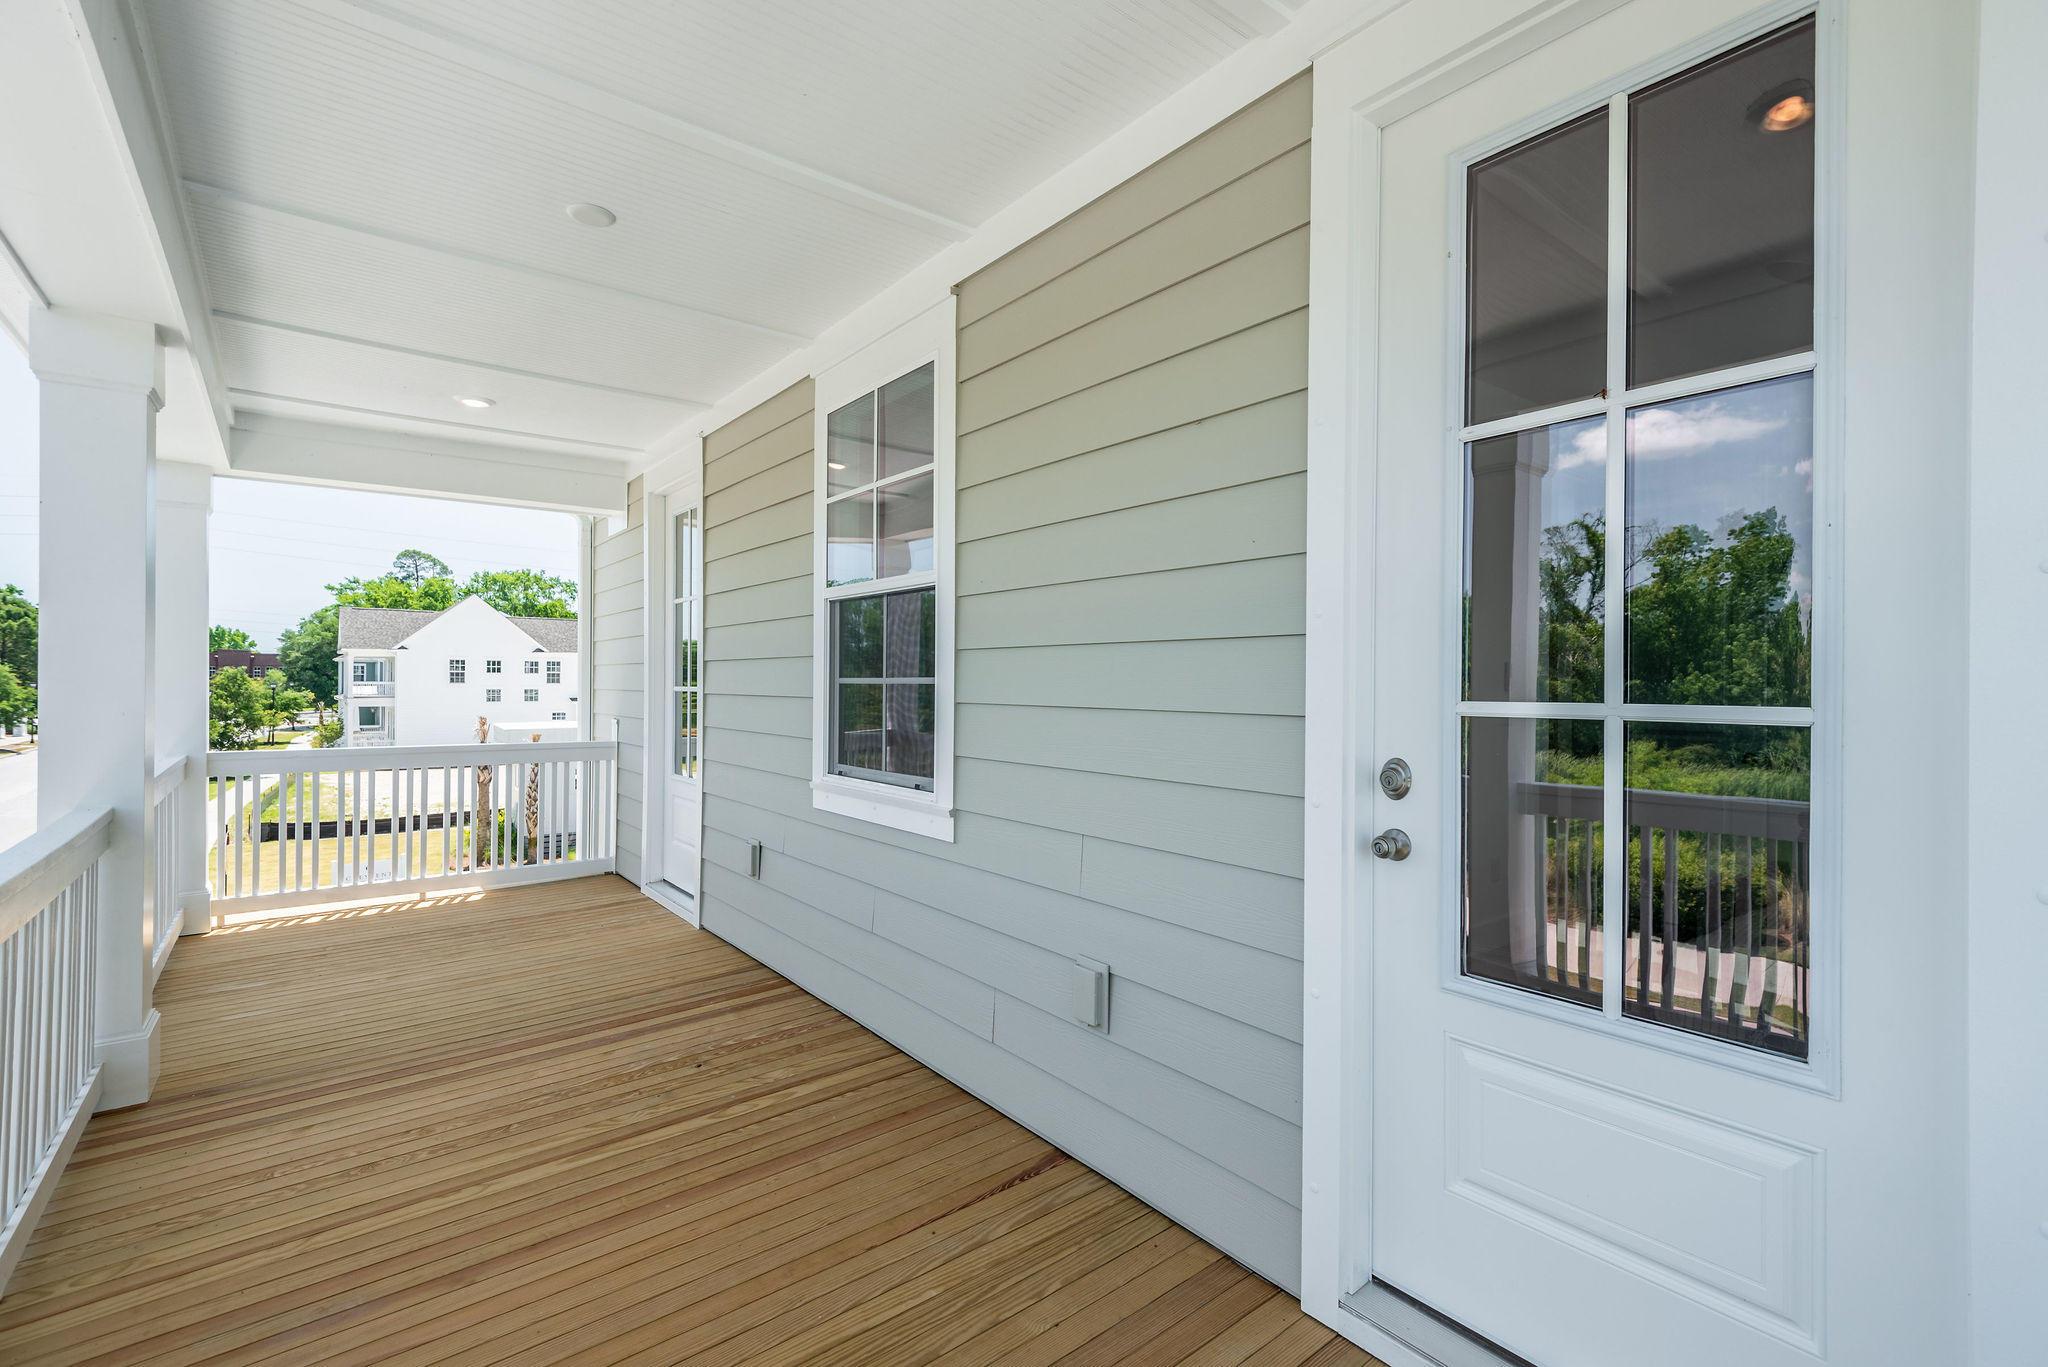 Midtown Homes For Sale - 1344 Upper Union, Mount Pleasant, SC - 37